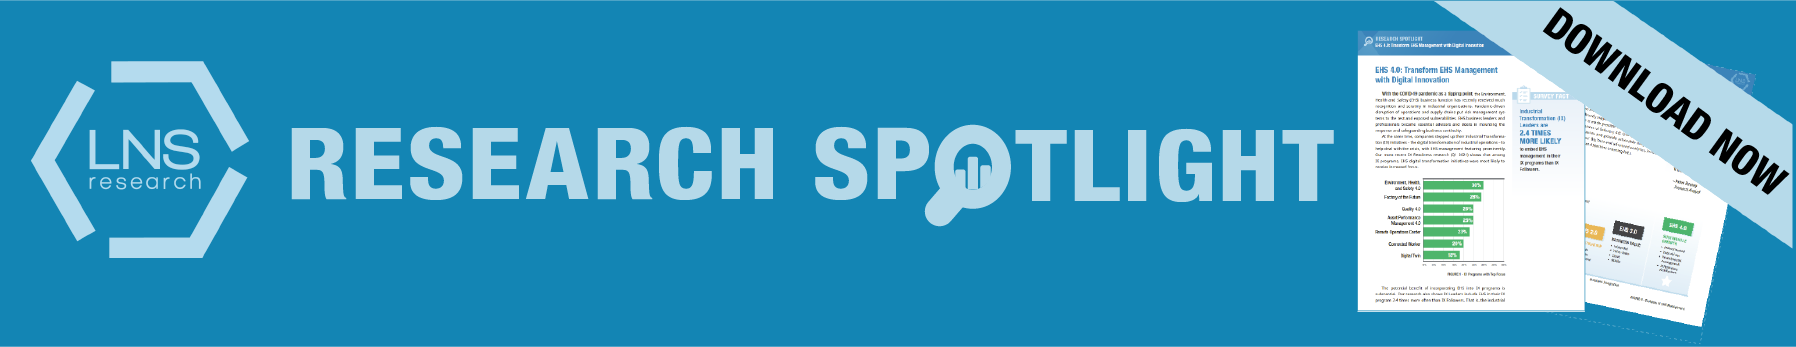 EHS 40 Spotlight Header SP2 REvised for SEO